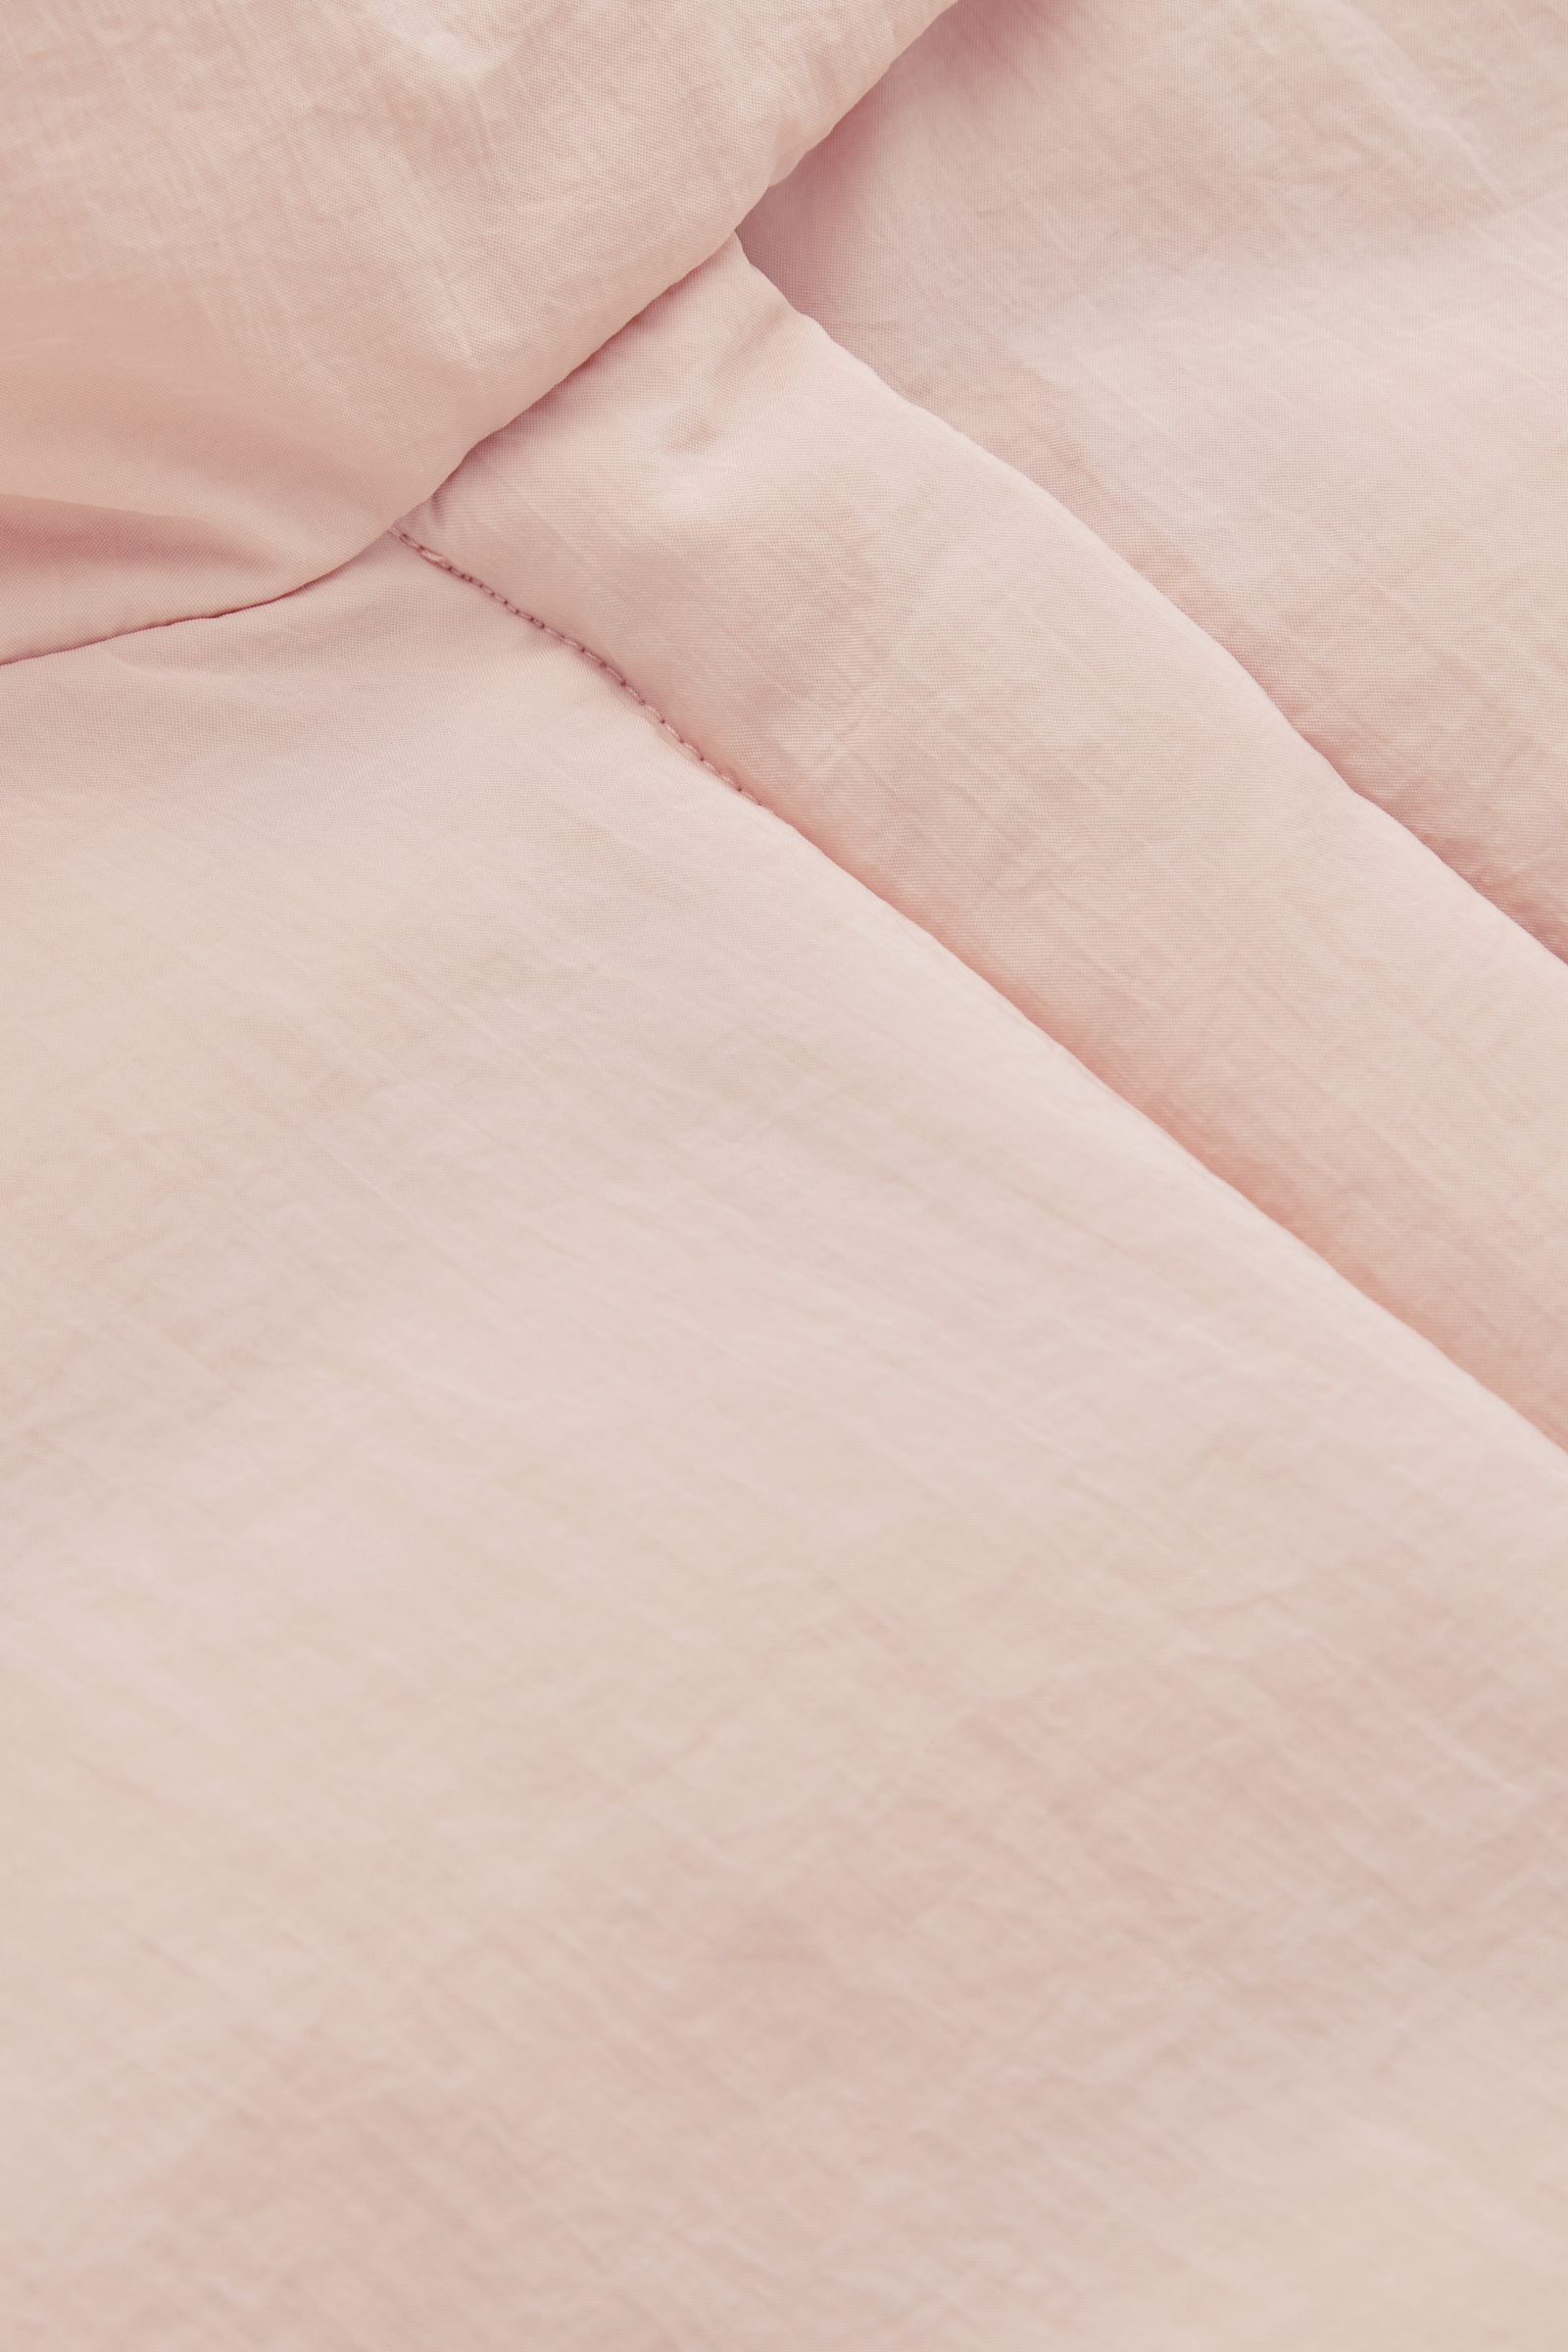 COS 플라워다운™ 하이브리드 패딩 재킷의 더스티 라이트 핑크컬러 Detail입니다.